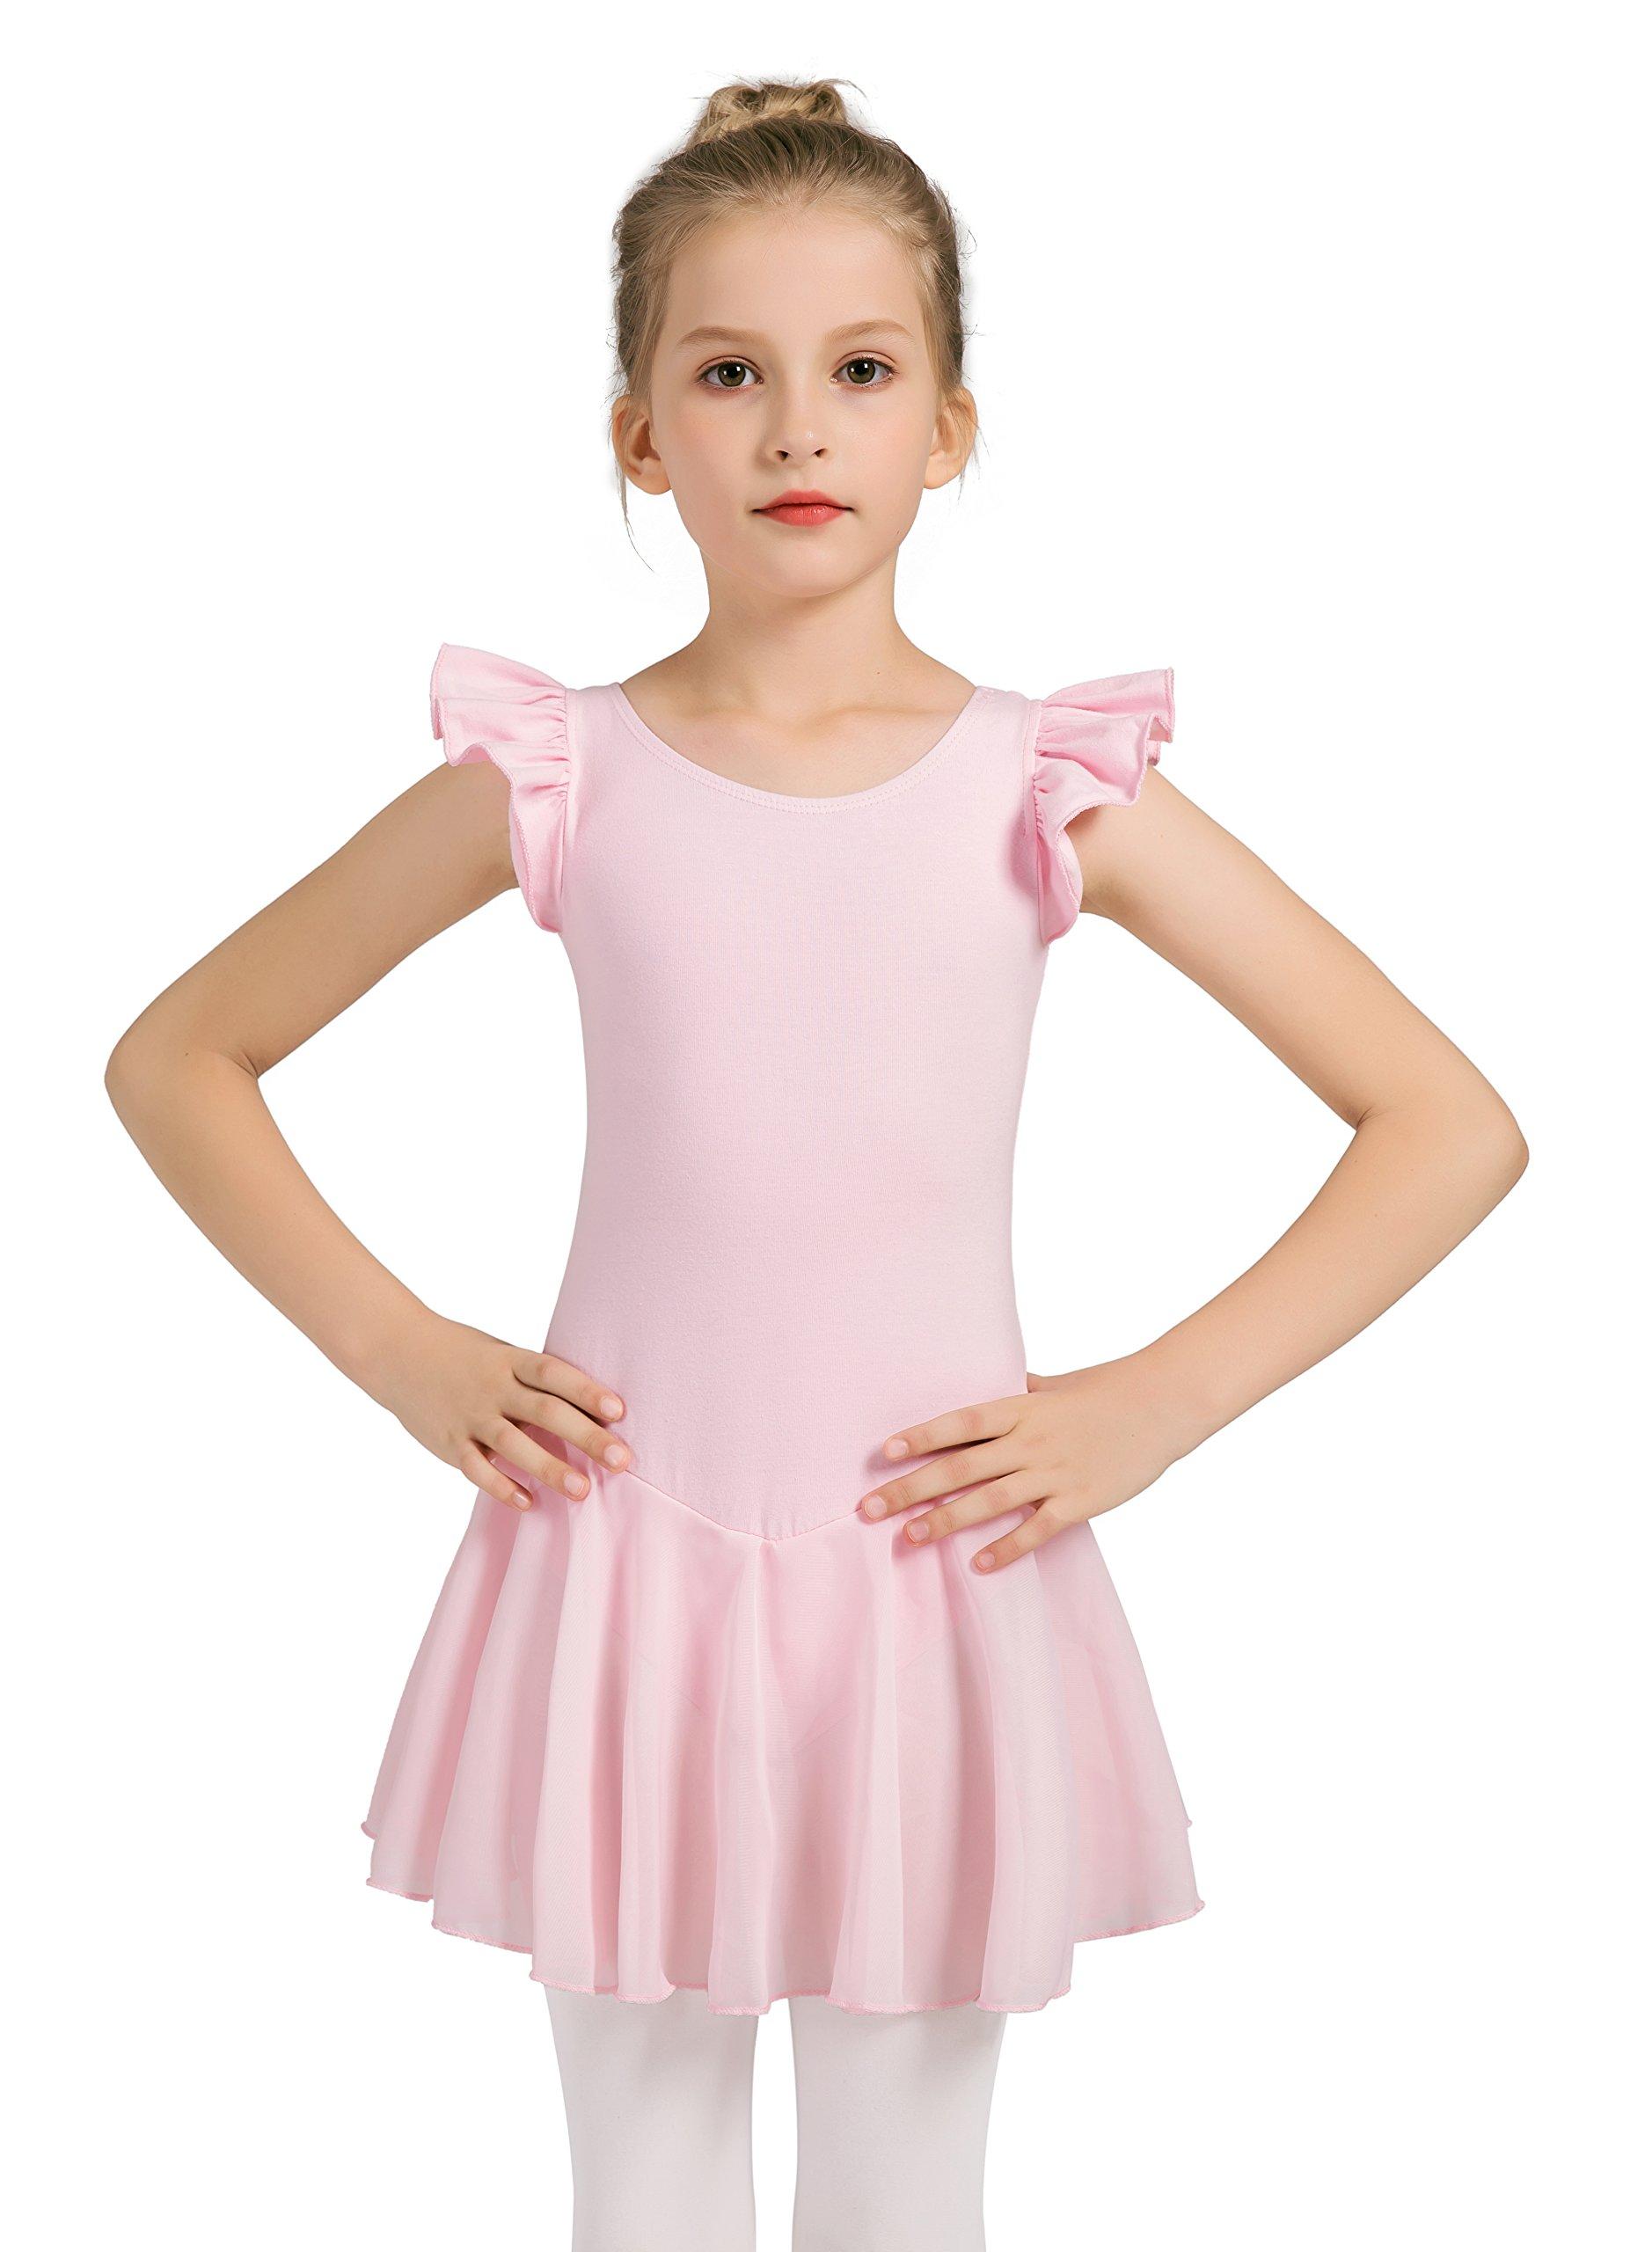 892c829fd3c04 Girls Dance Ballet Leotard with Flying Sleeve Flowy Tutu Skirt Children  Cotton Dress Dancewear (6-8 Years, Pink)